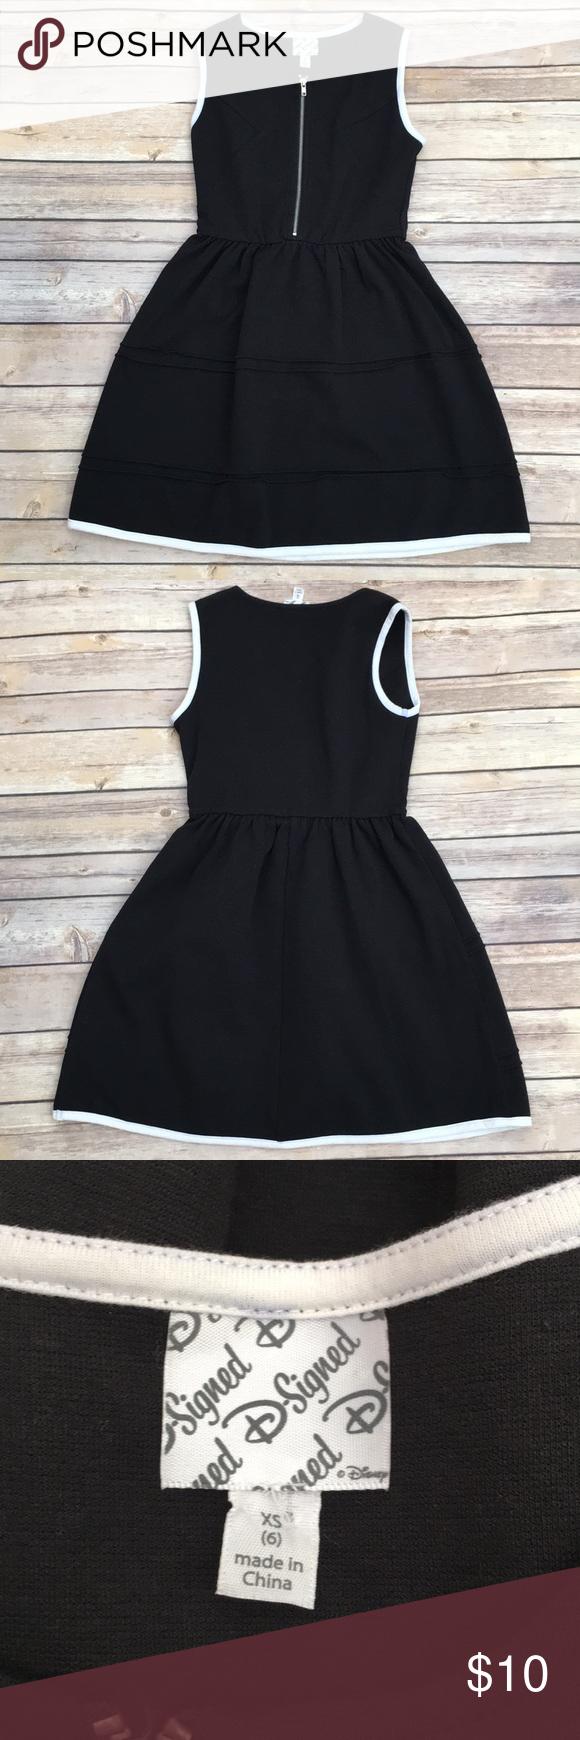 D Signed Dress Clothes Design Black Sleeveless Dress Dresses [ 1740 x 580 Pixel ]